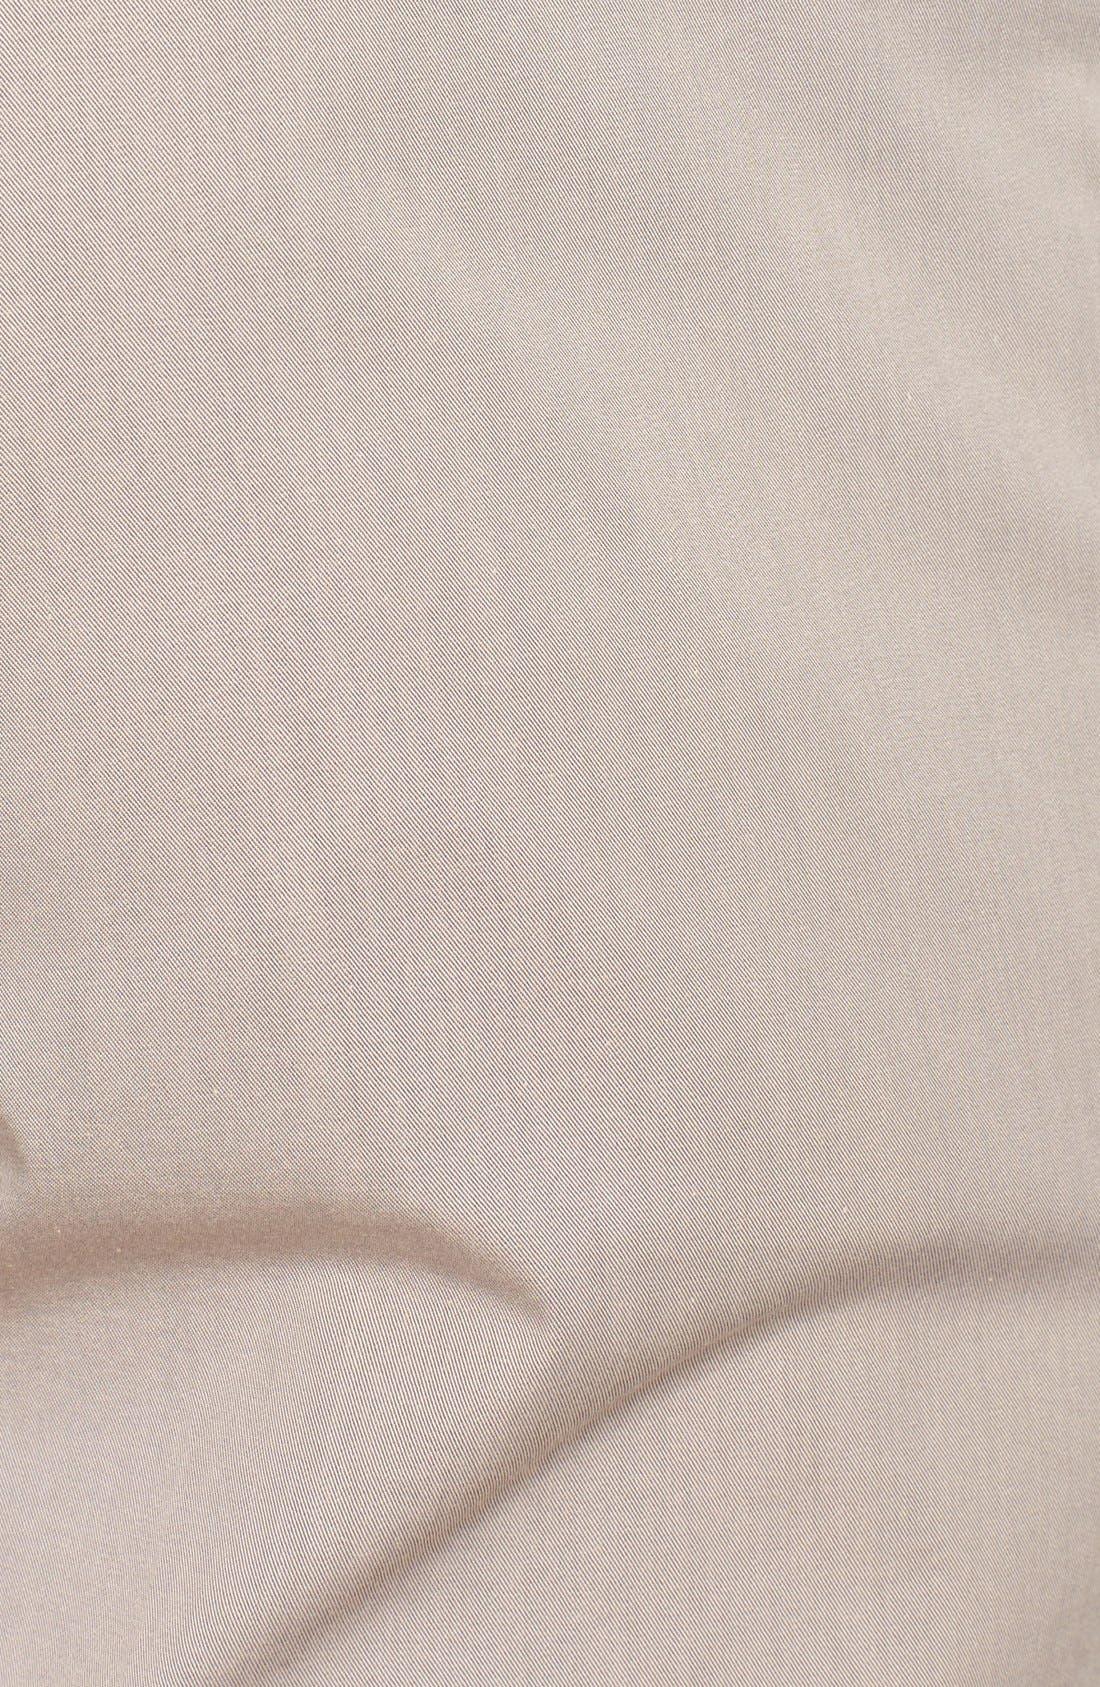 Alternate Image 3  - Canali Five Pocket Stretch Cotton Italian Pants